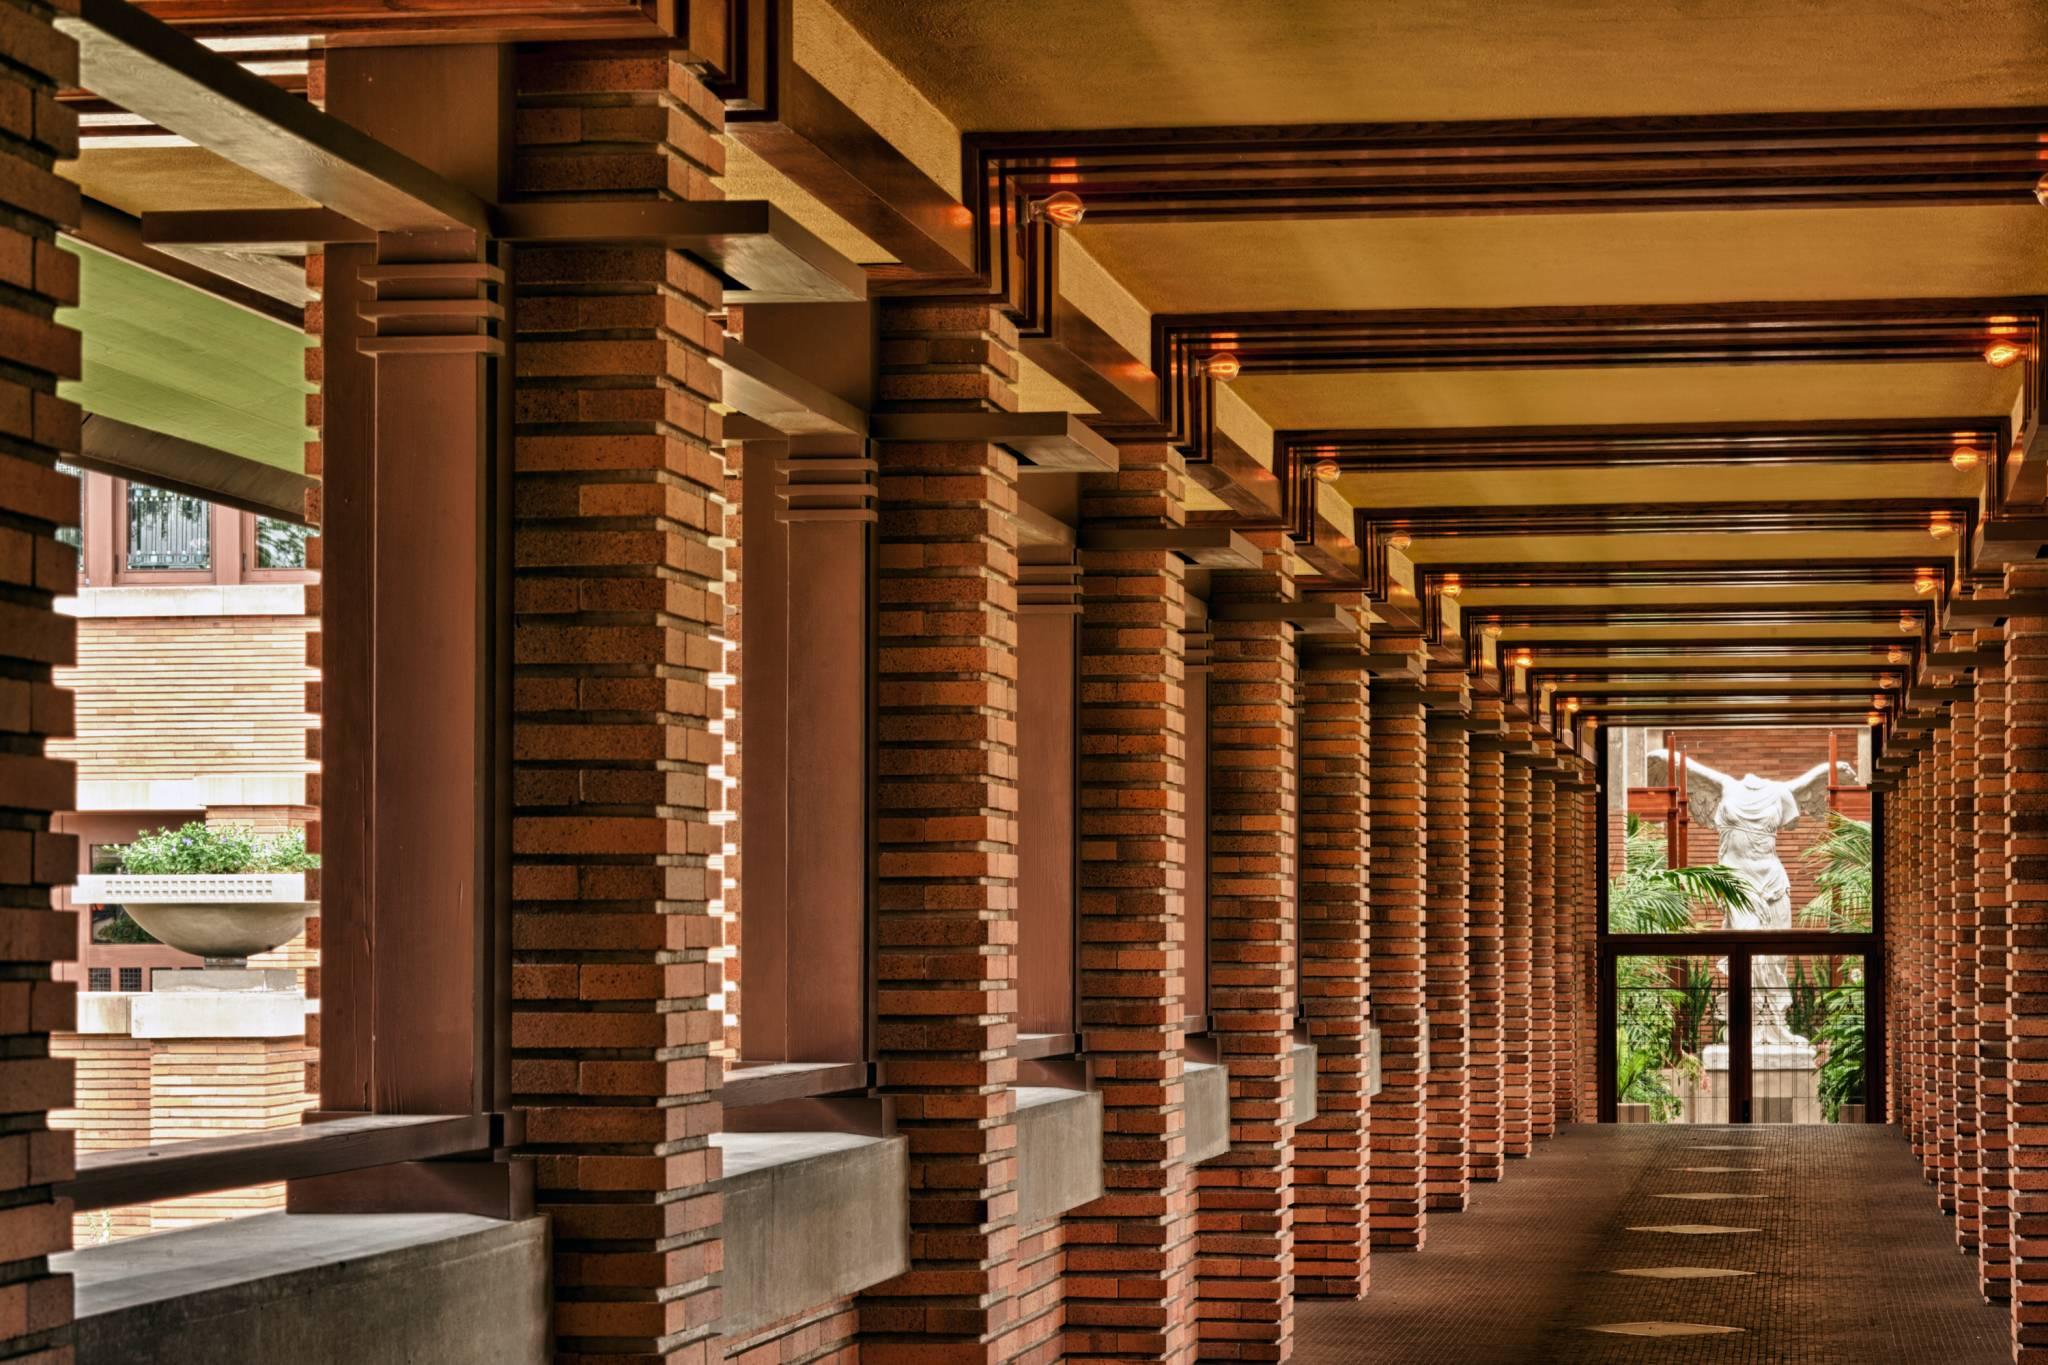 architectural photography darwin martin house pergola frank lloyd wright design  in plain sight